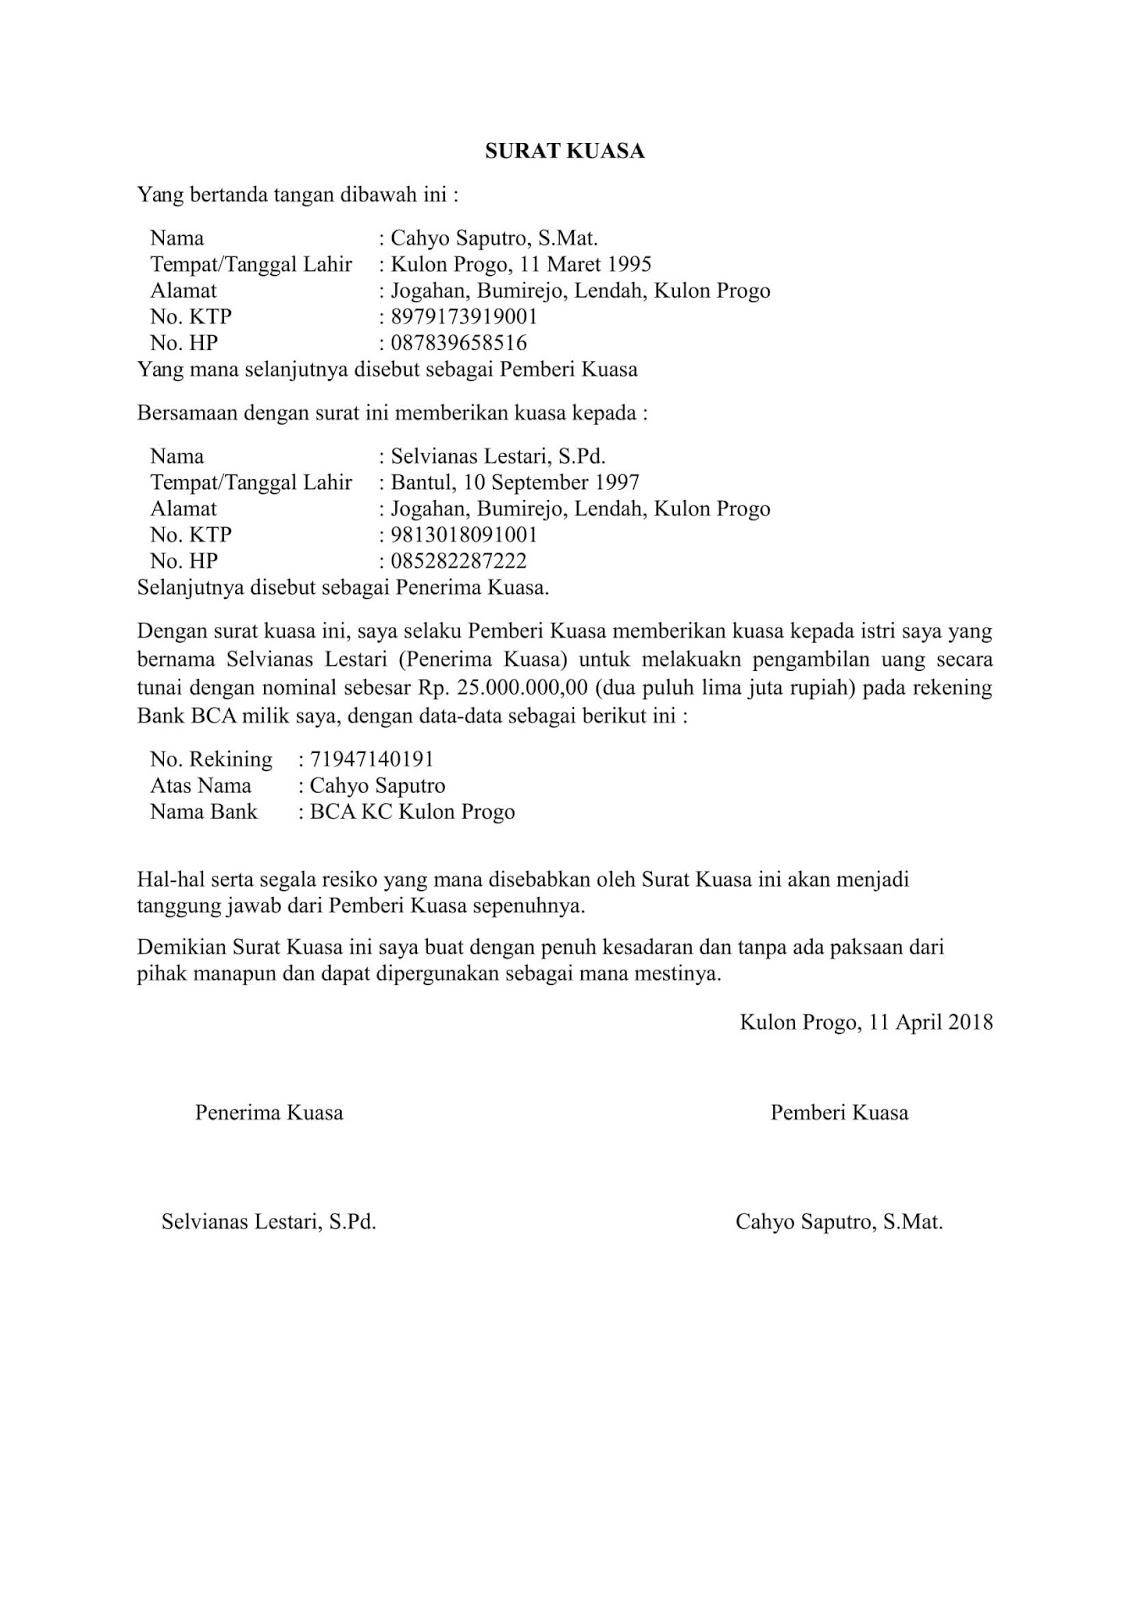 contoh surat kuasa pengambilan uang di bank BNI, Mandiri, BCA, BRI